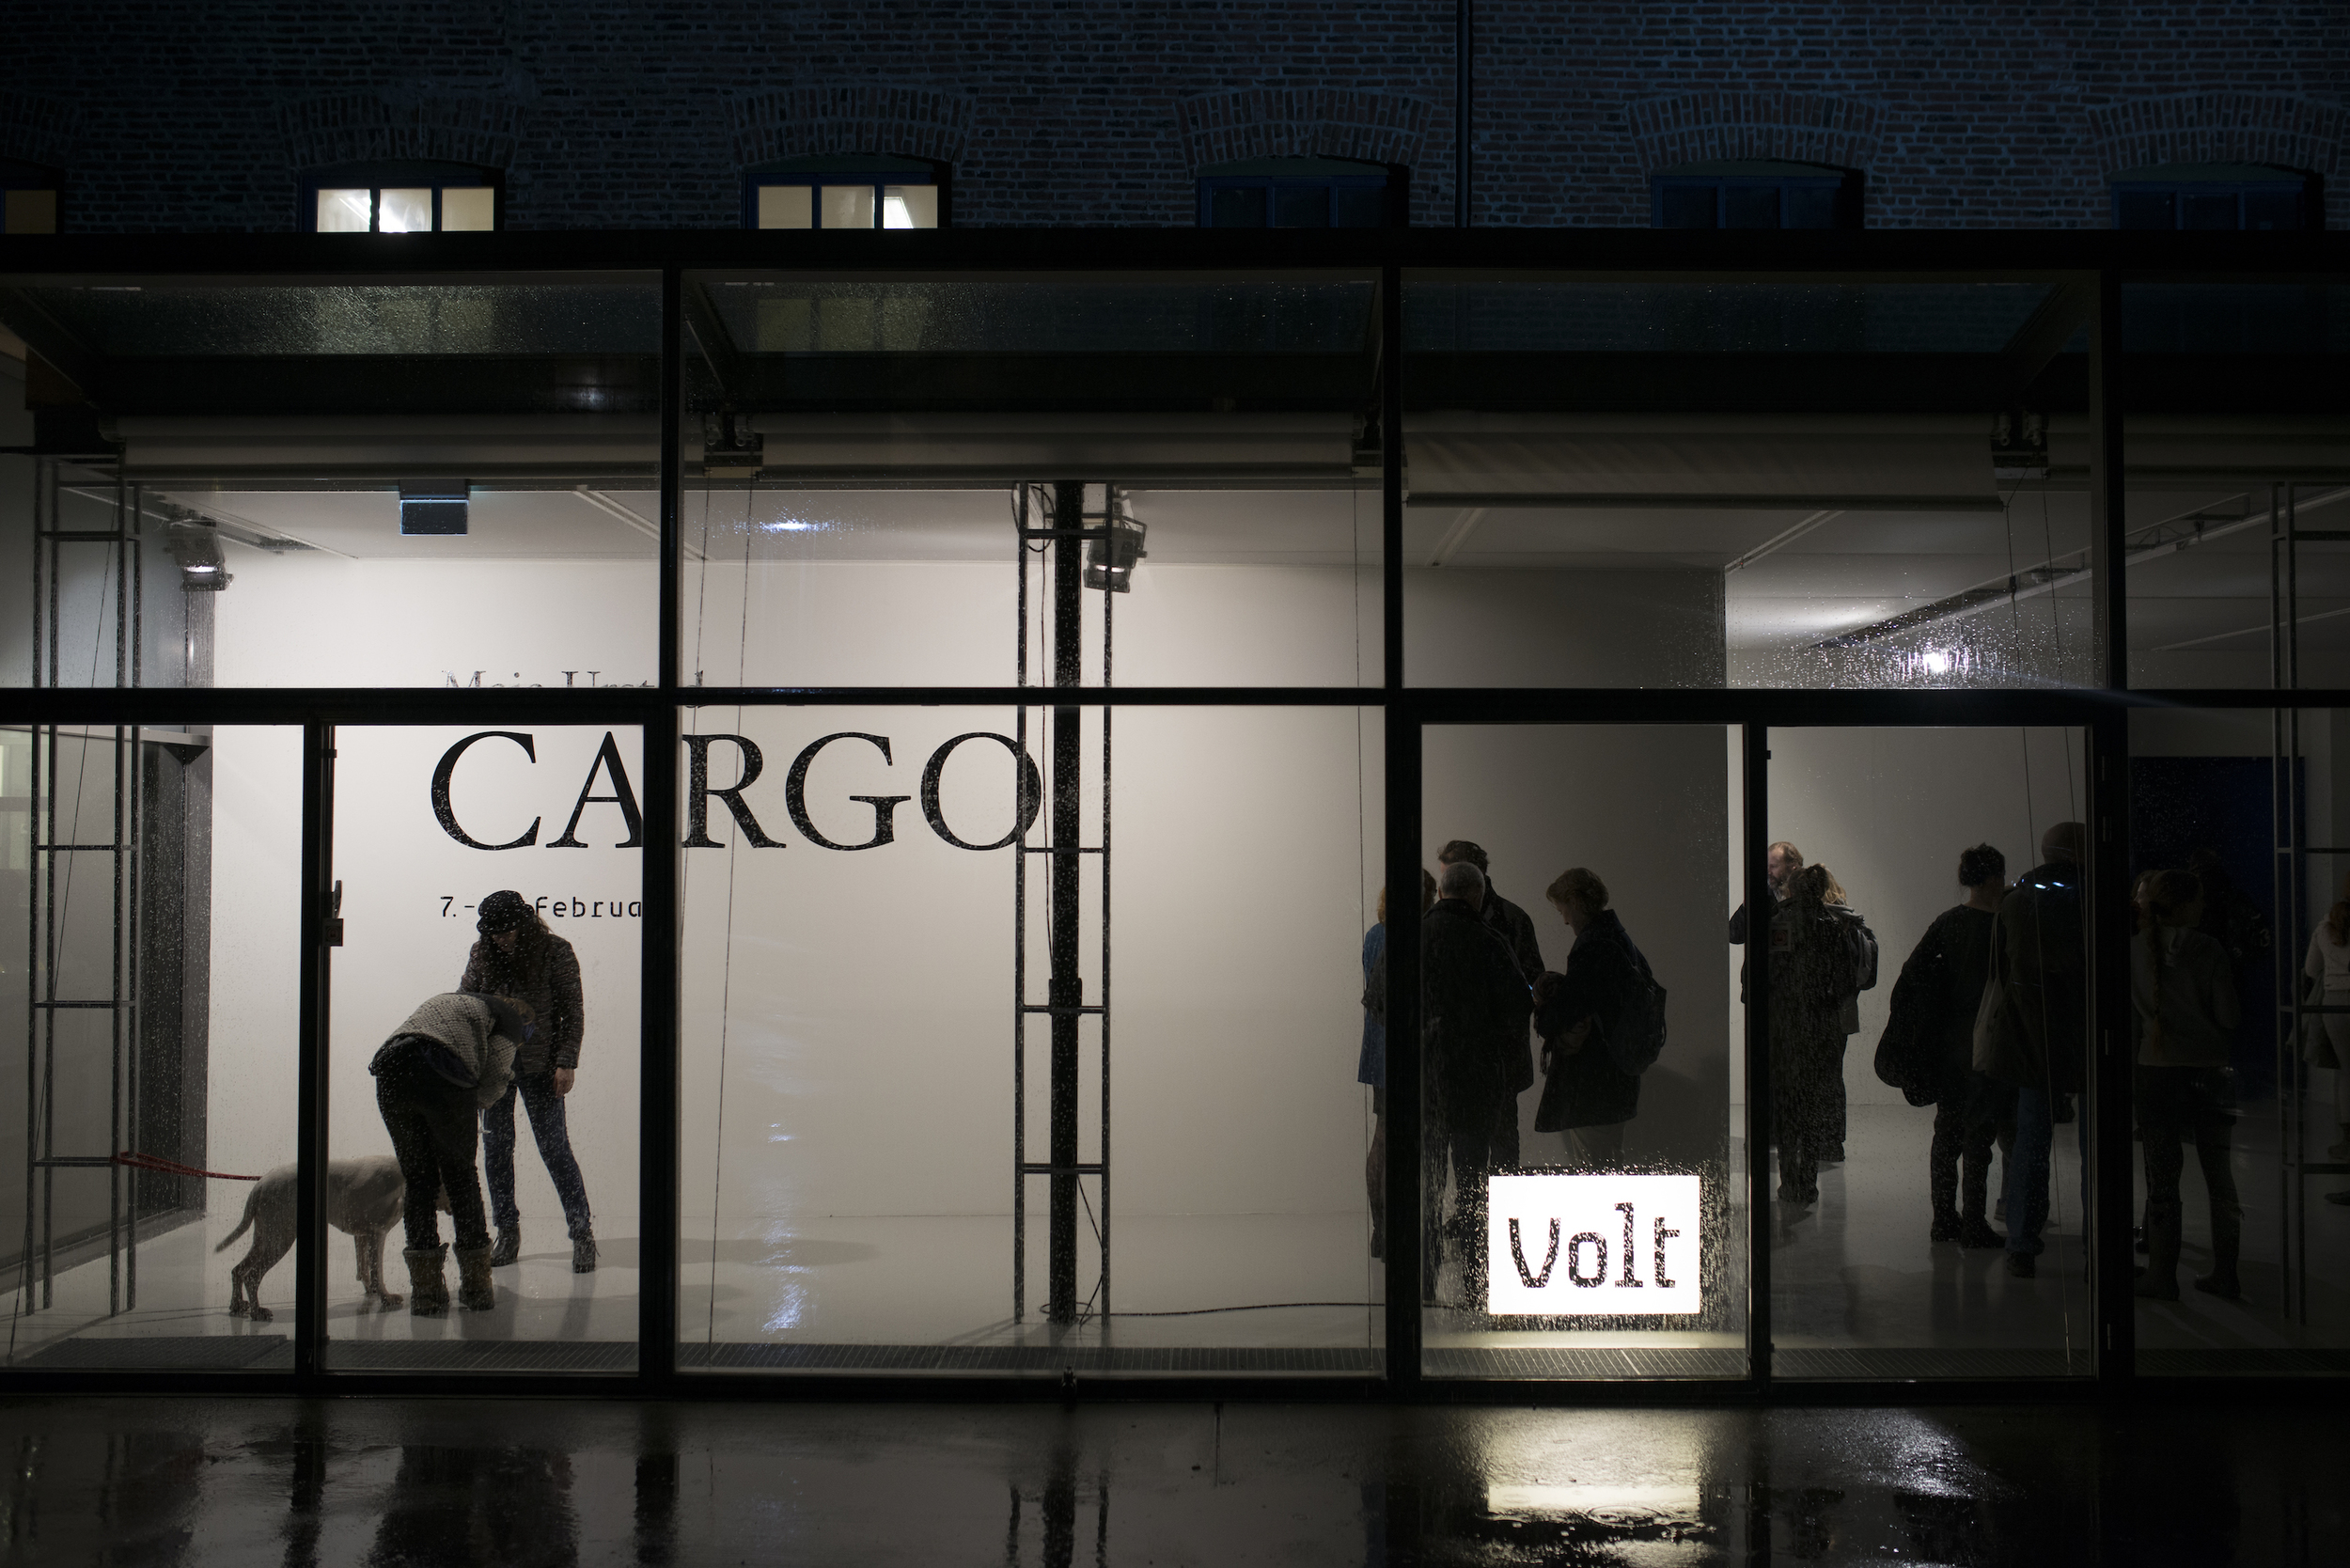 Image: Sound installation Cargo by artist Maia Urstad, Visningsrommet USF